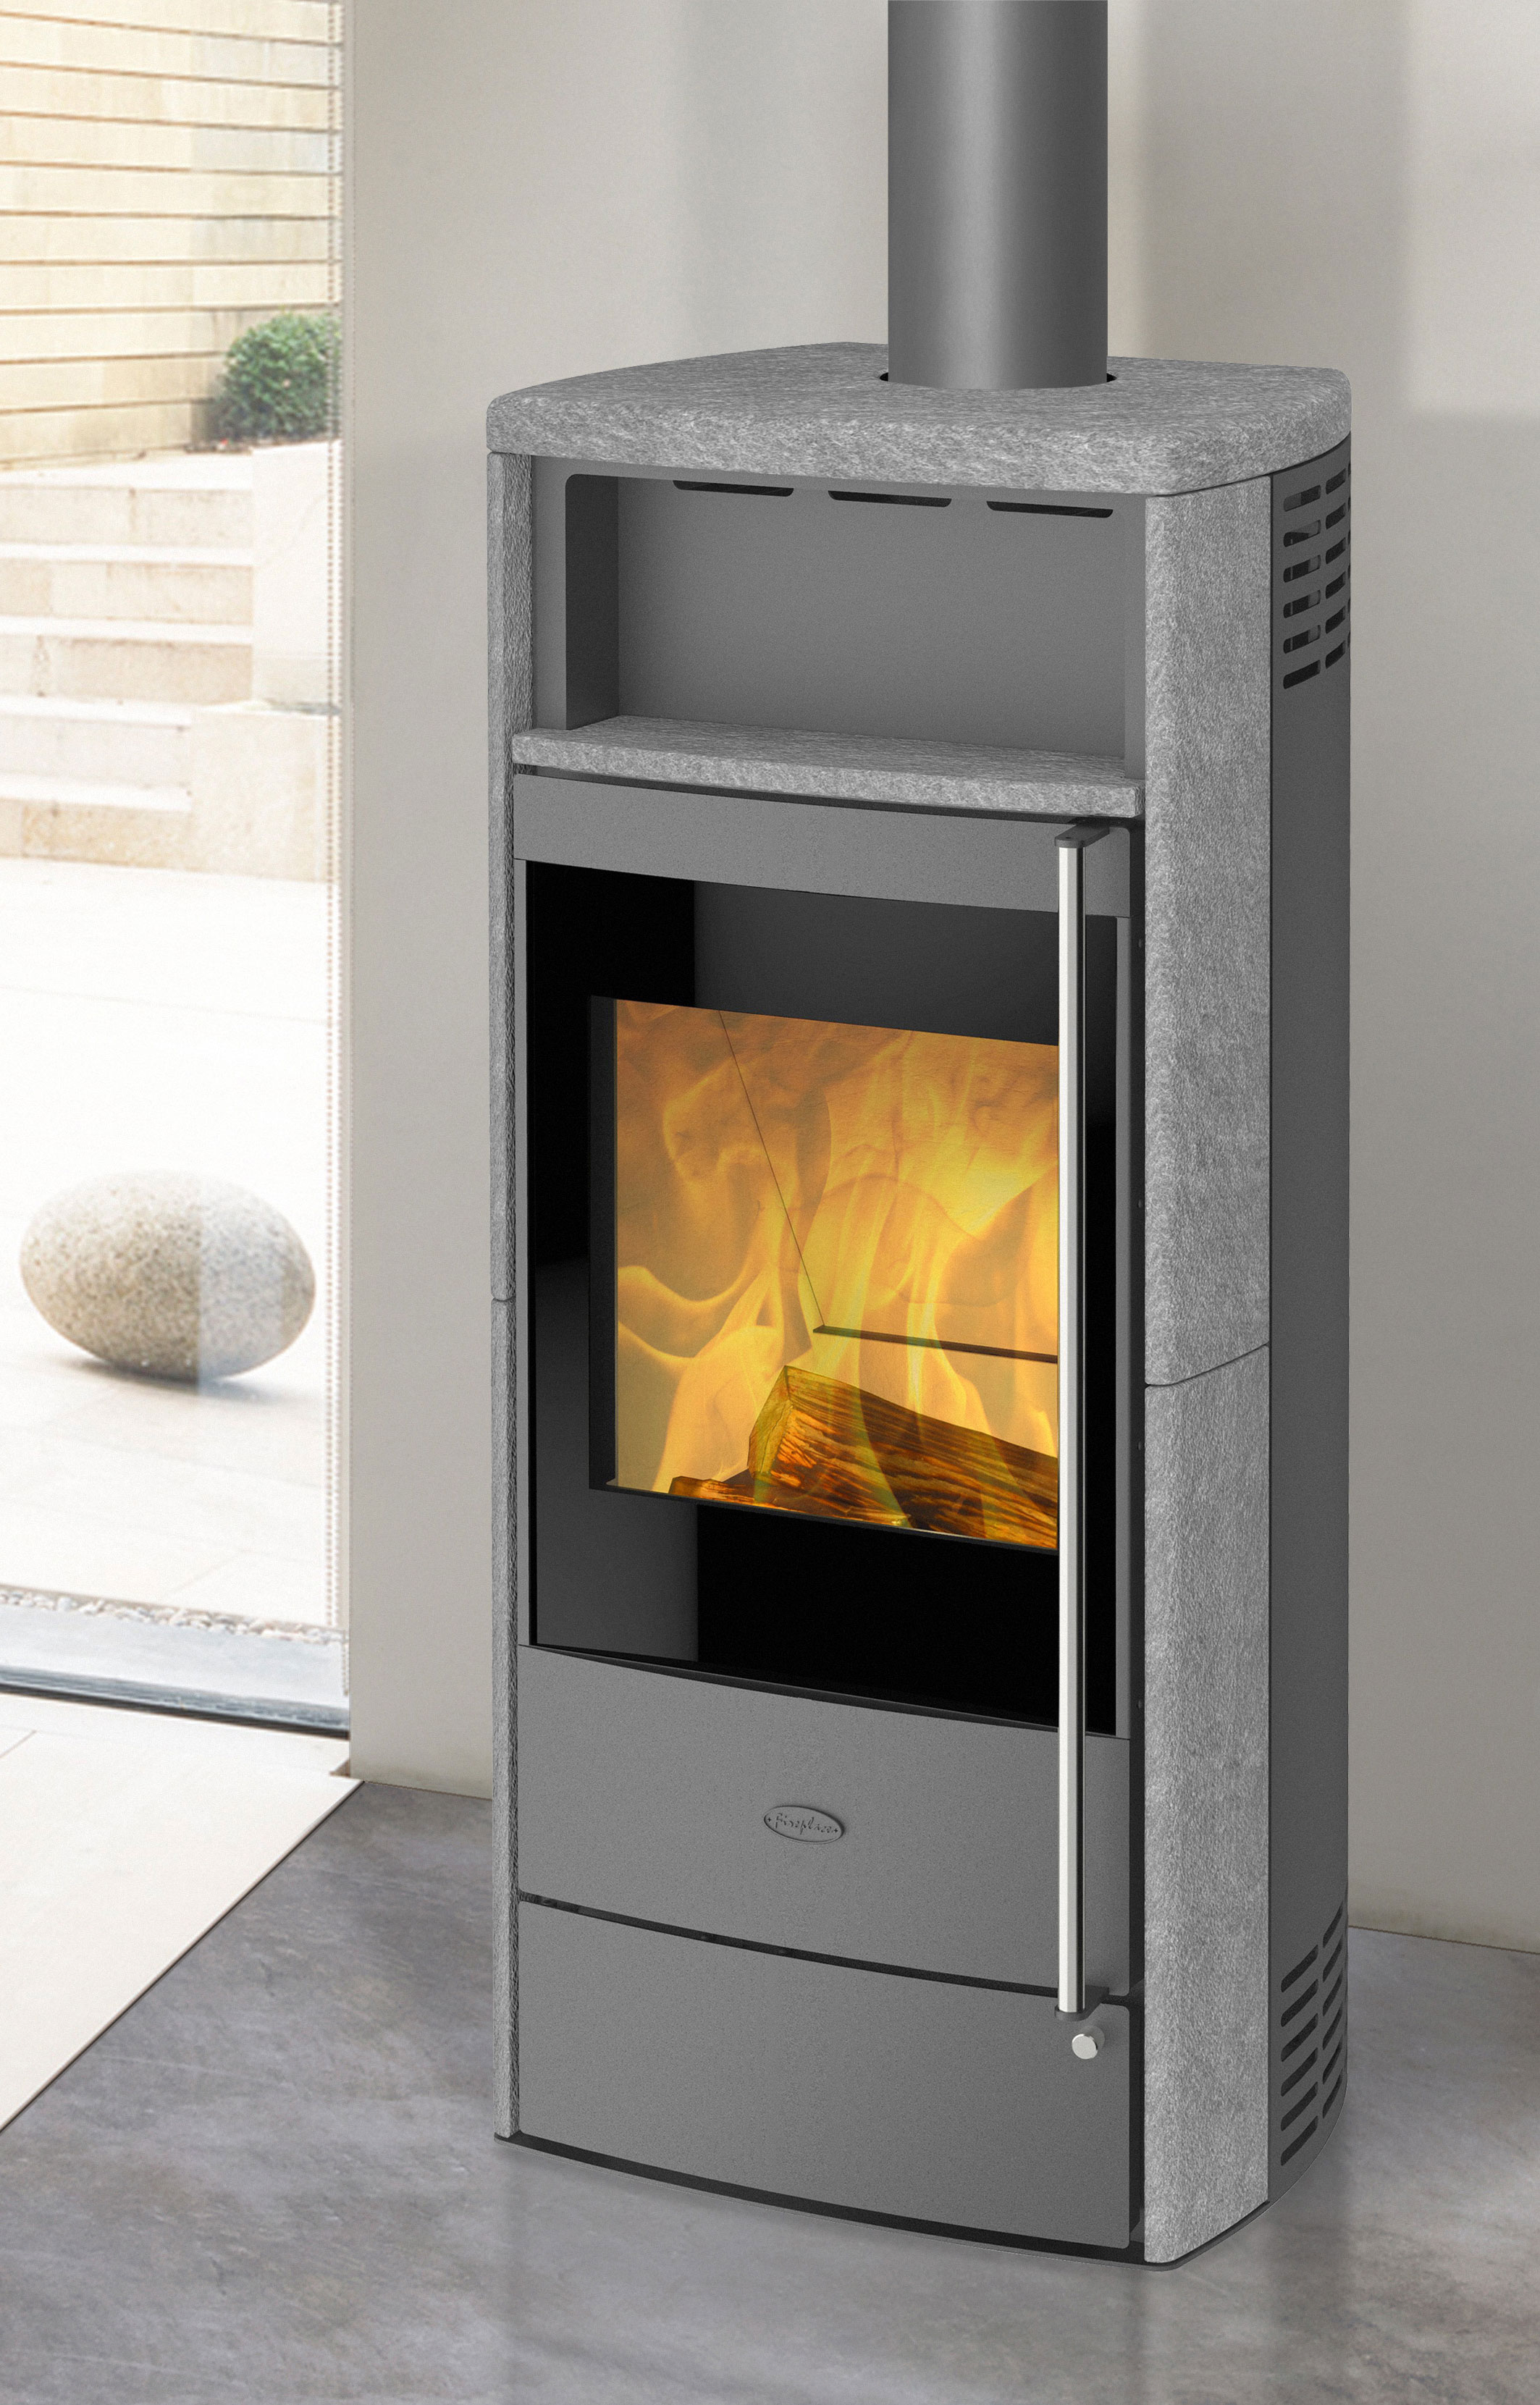 Gut bekannt Kaminofen Dauerbrandofen Fireplace Teramo raumluftunabhängig 6kW OA42